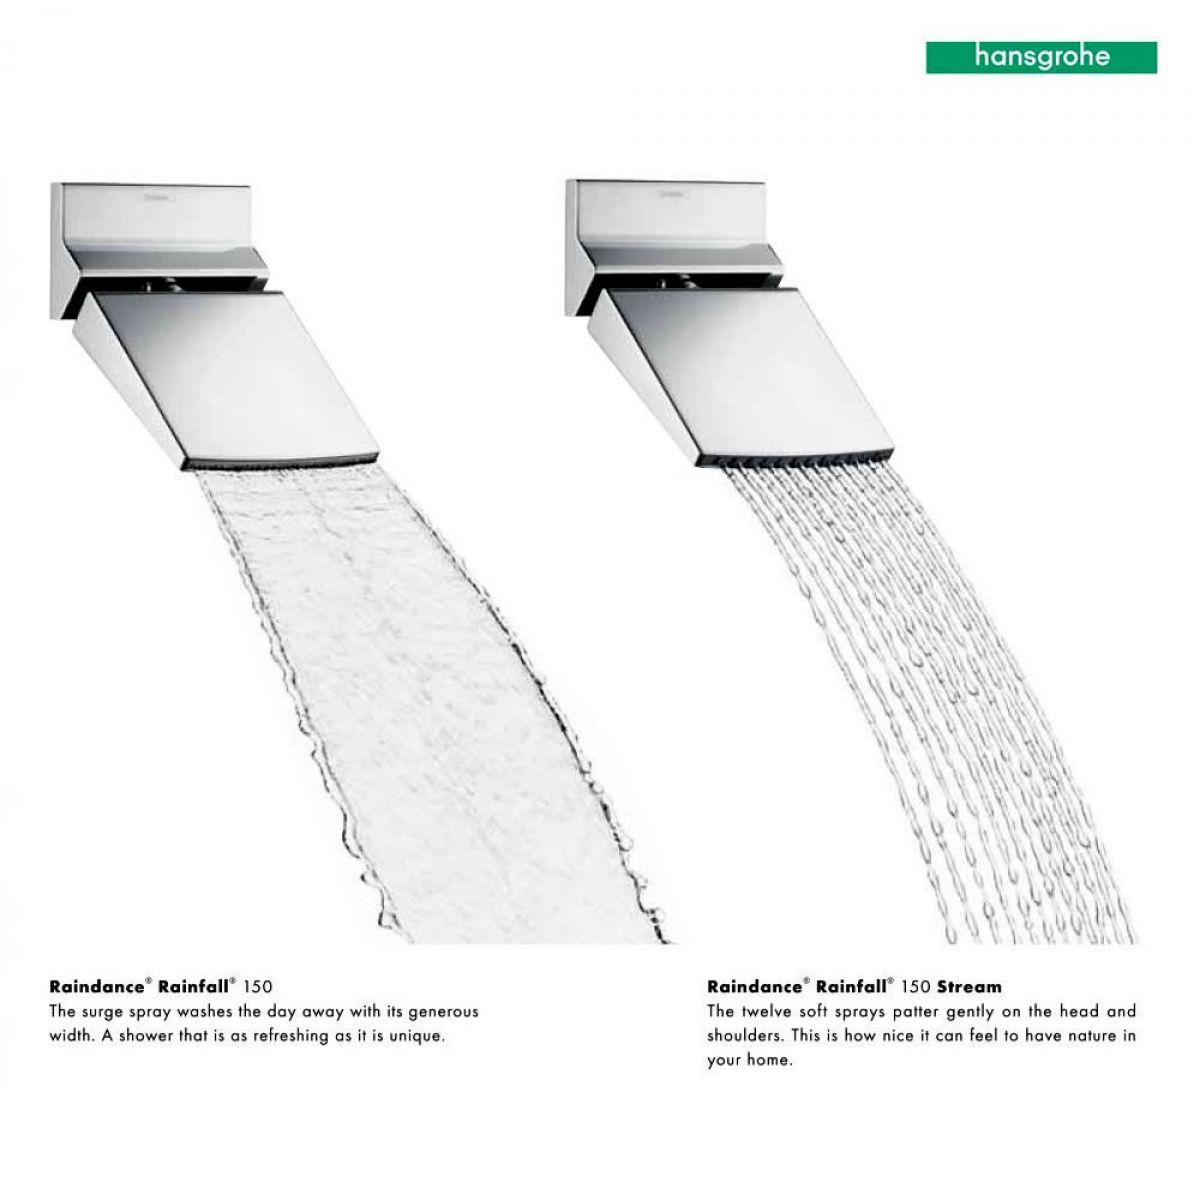 hansgrohe raindance rainfall 150 shower head uk bathrooms. Black Bedroom Furniture Sets. Home Design Ideas